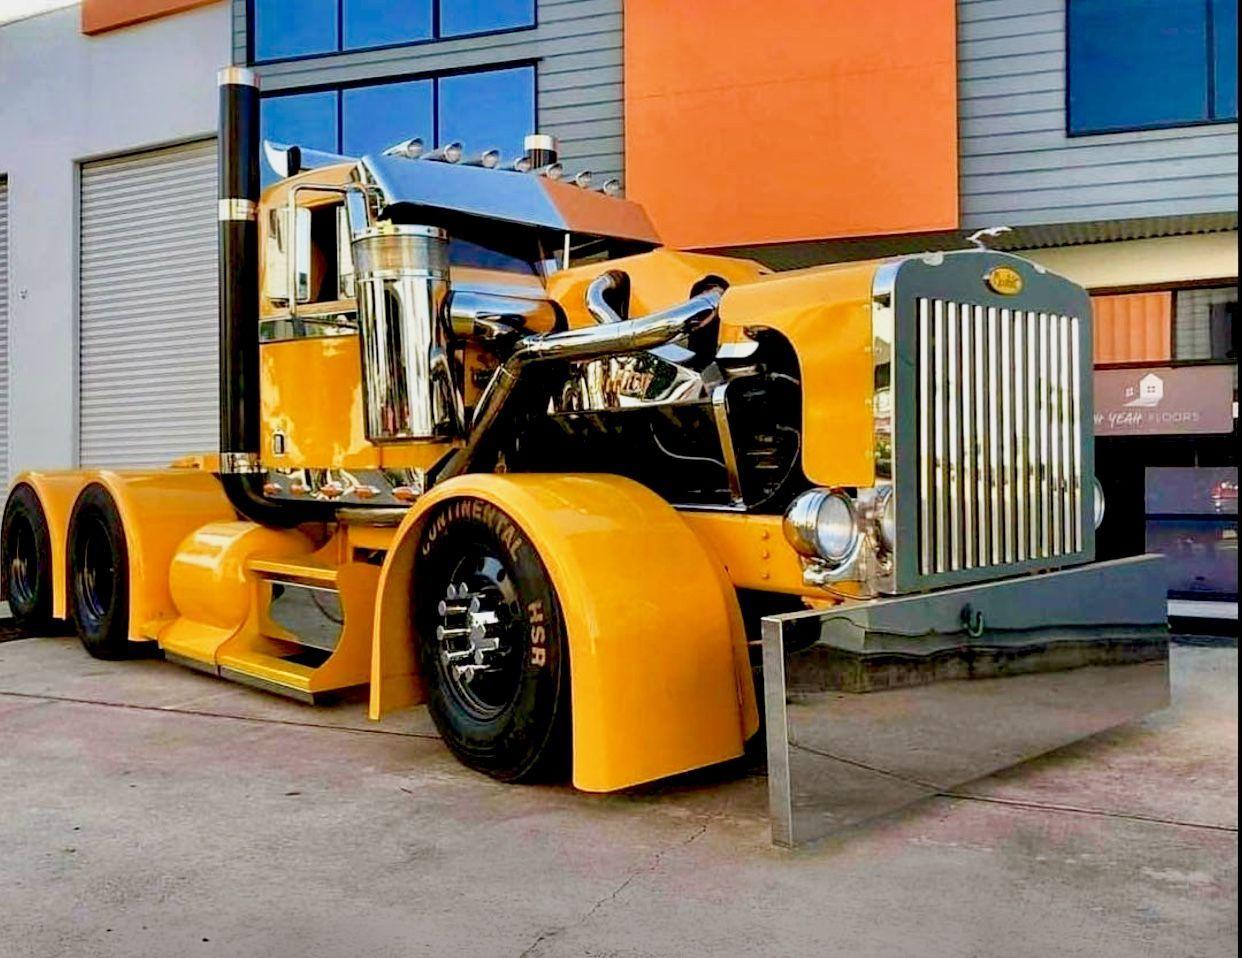 Classic Semi Truck The Biggest Trucks In The World The Body